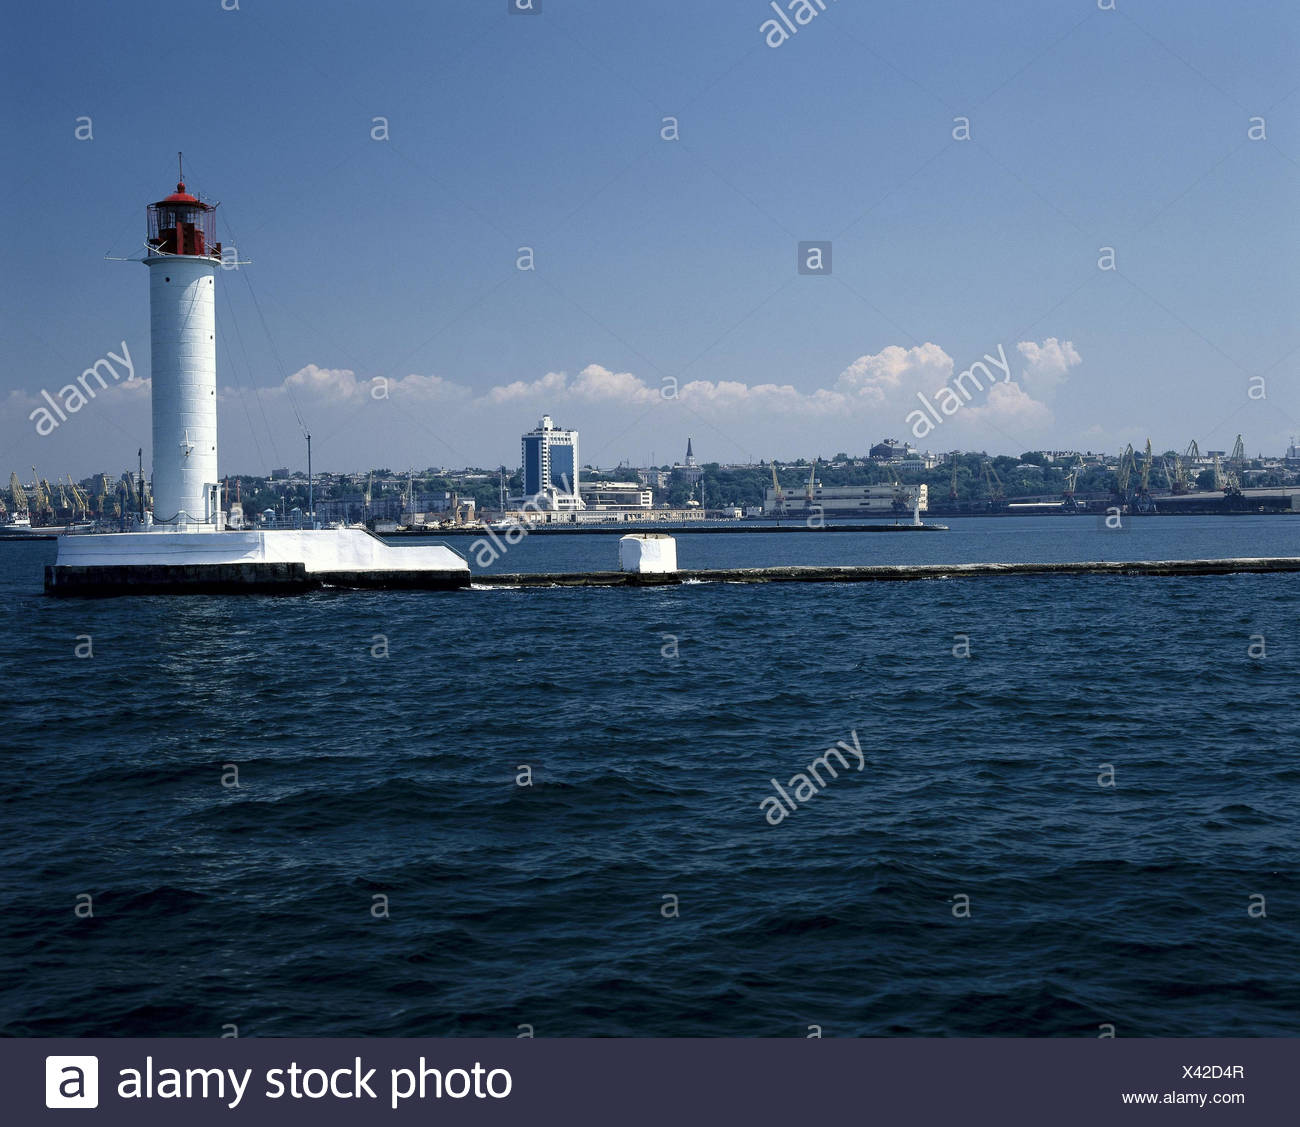 Ukraine Black Sea Stock Photos & Ukraine Black Sea Stock